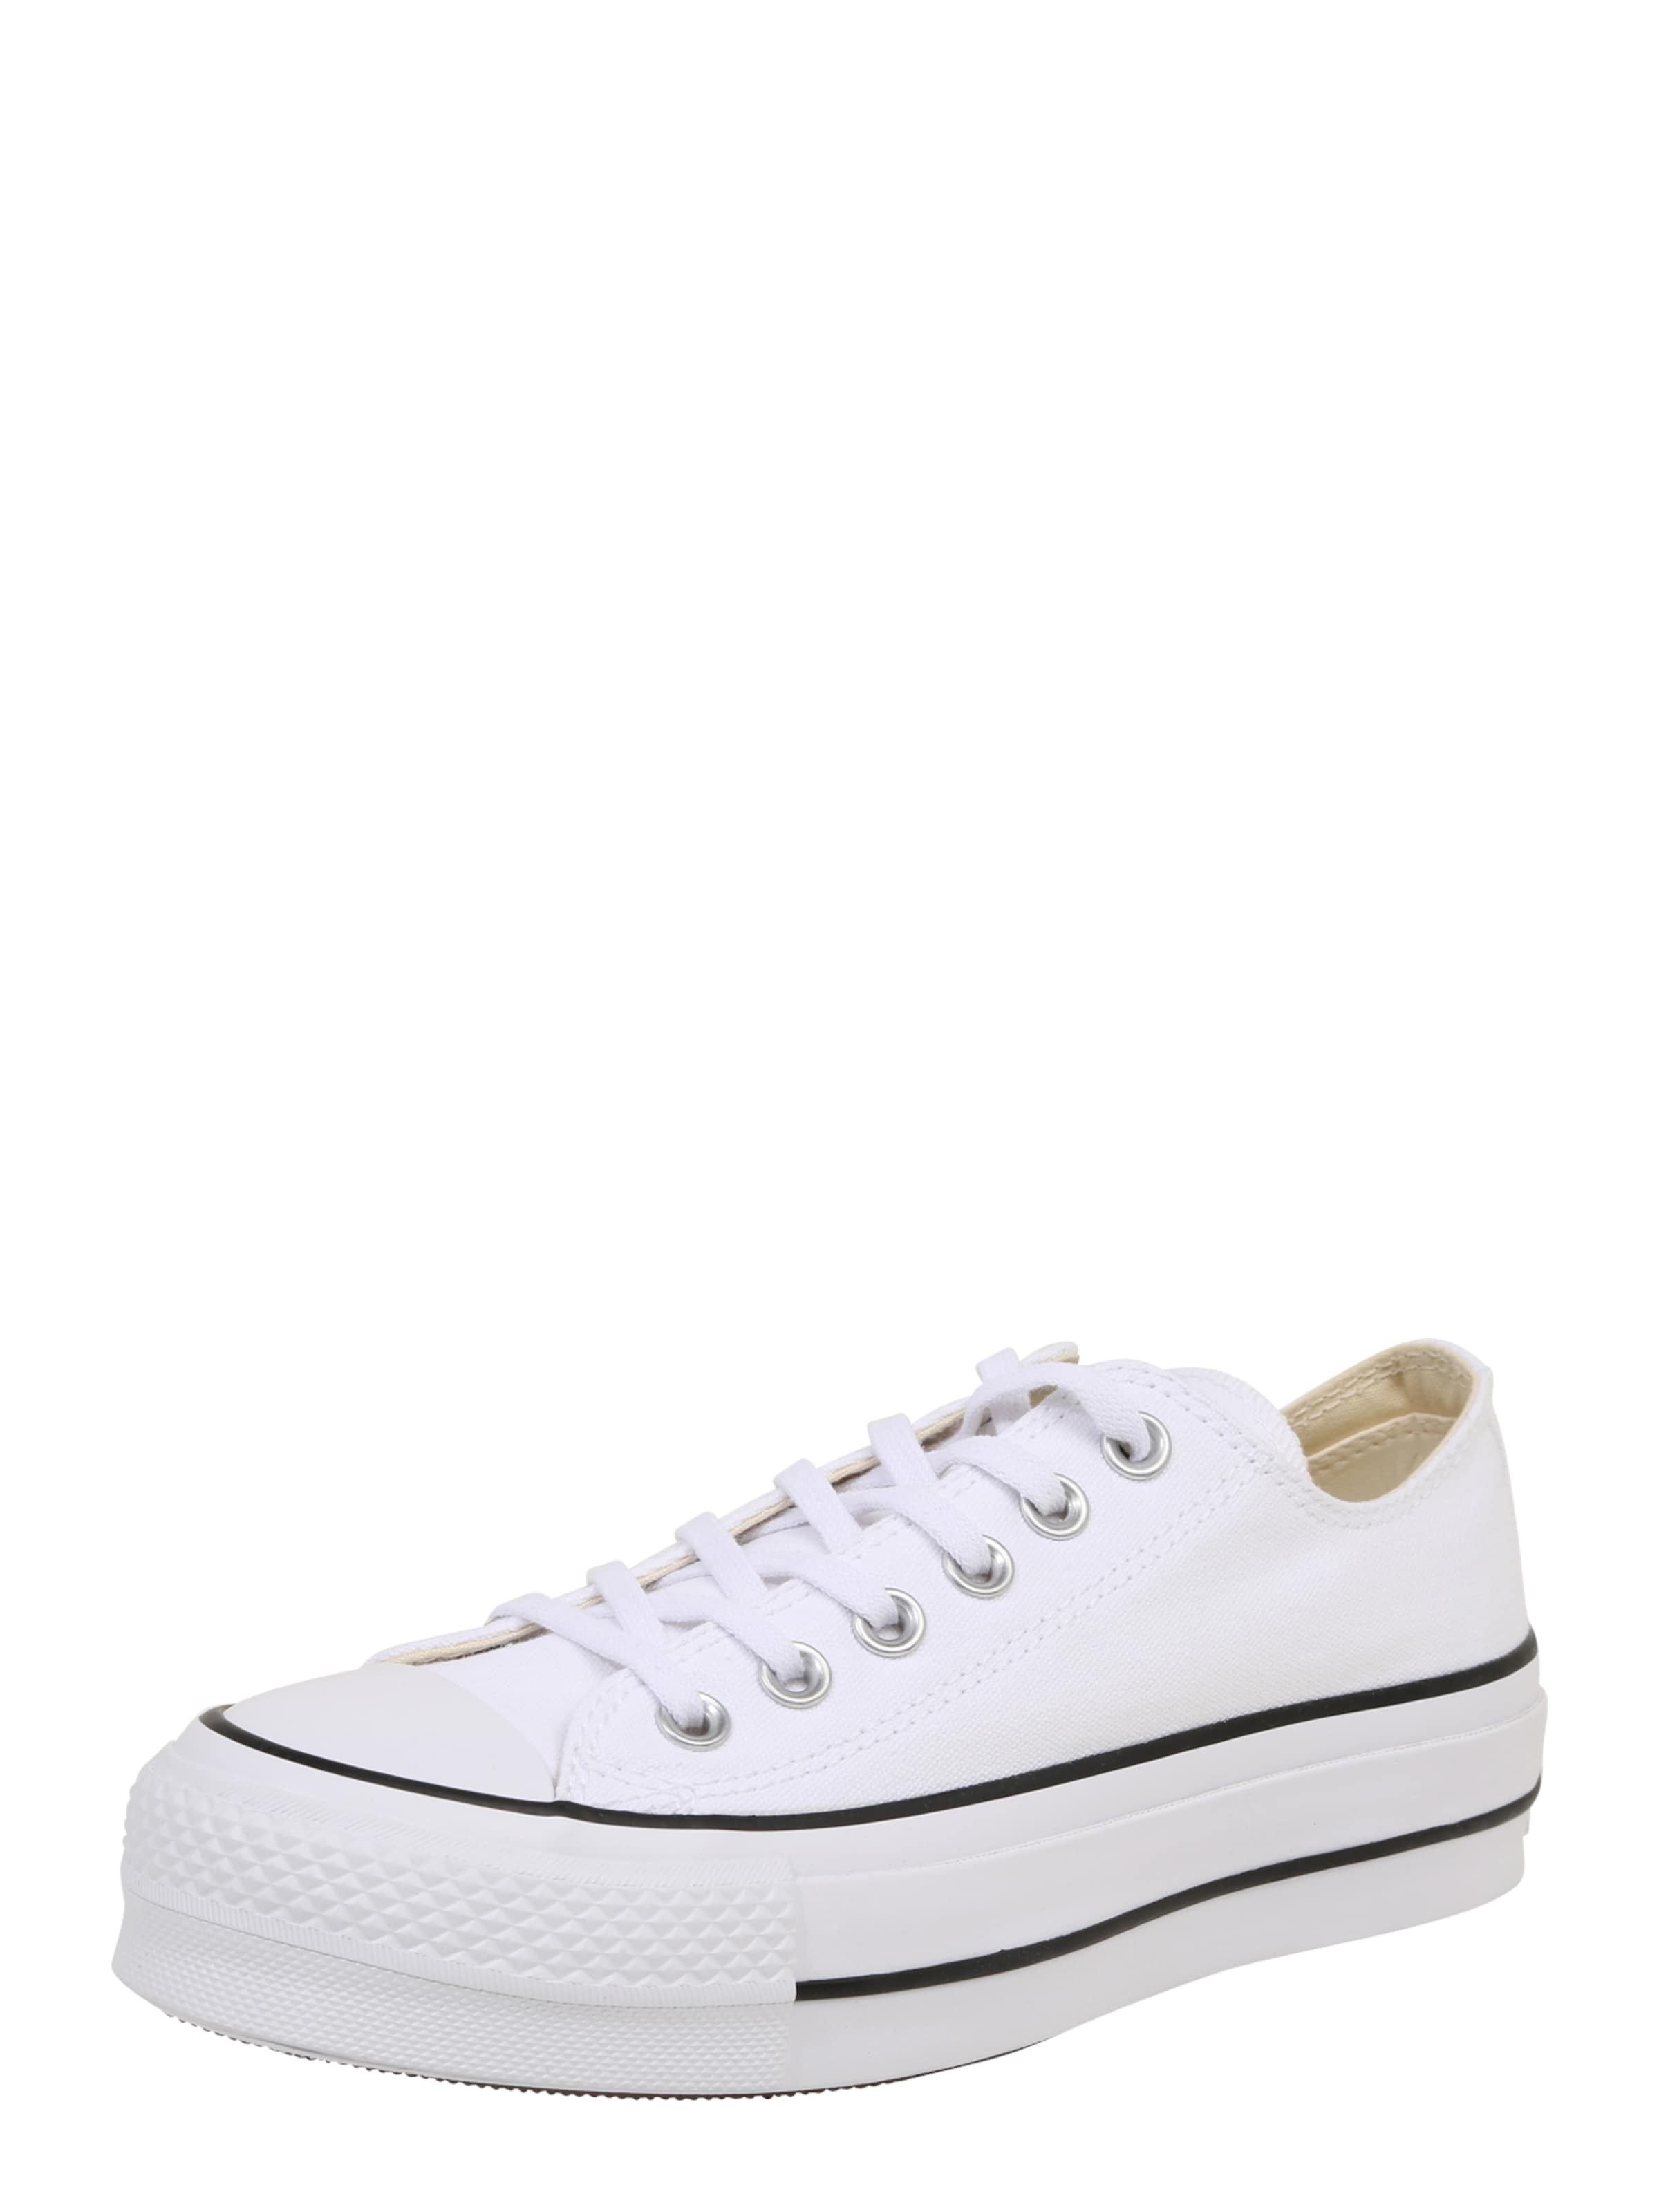 CONVERSE Plateau-Sneaker Lift Ox Verschleißfeste billige Schuhe